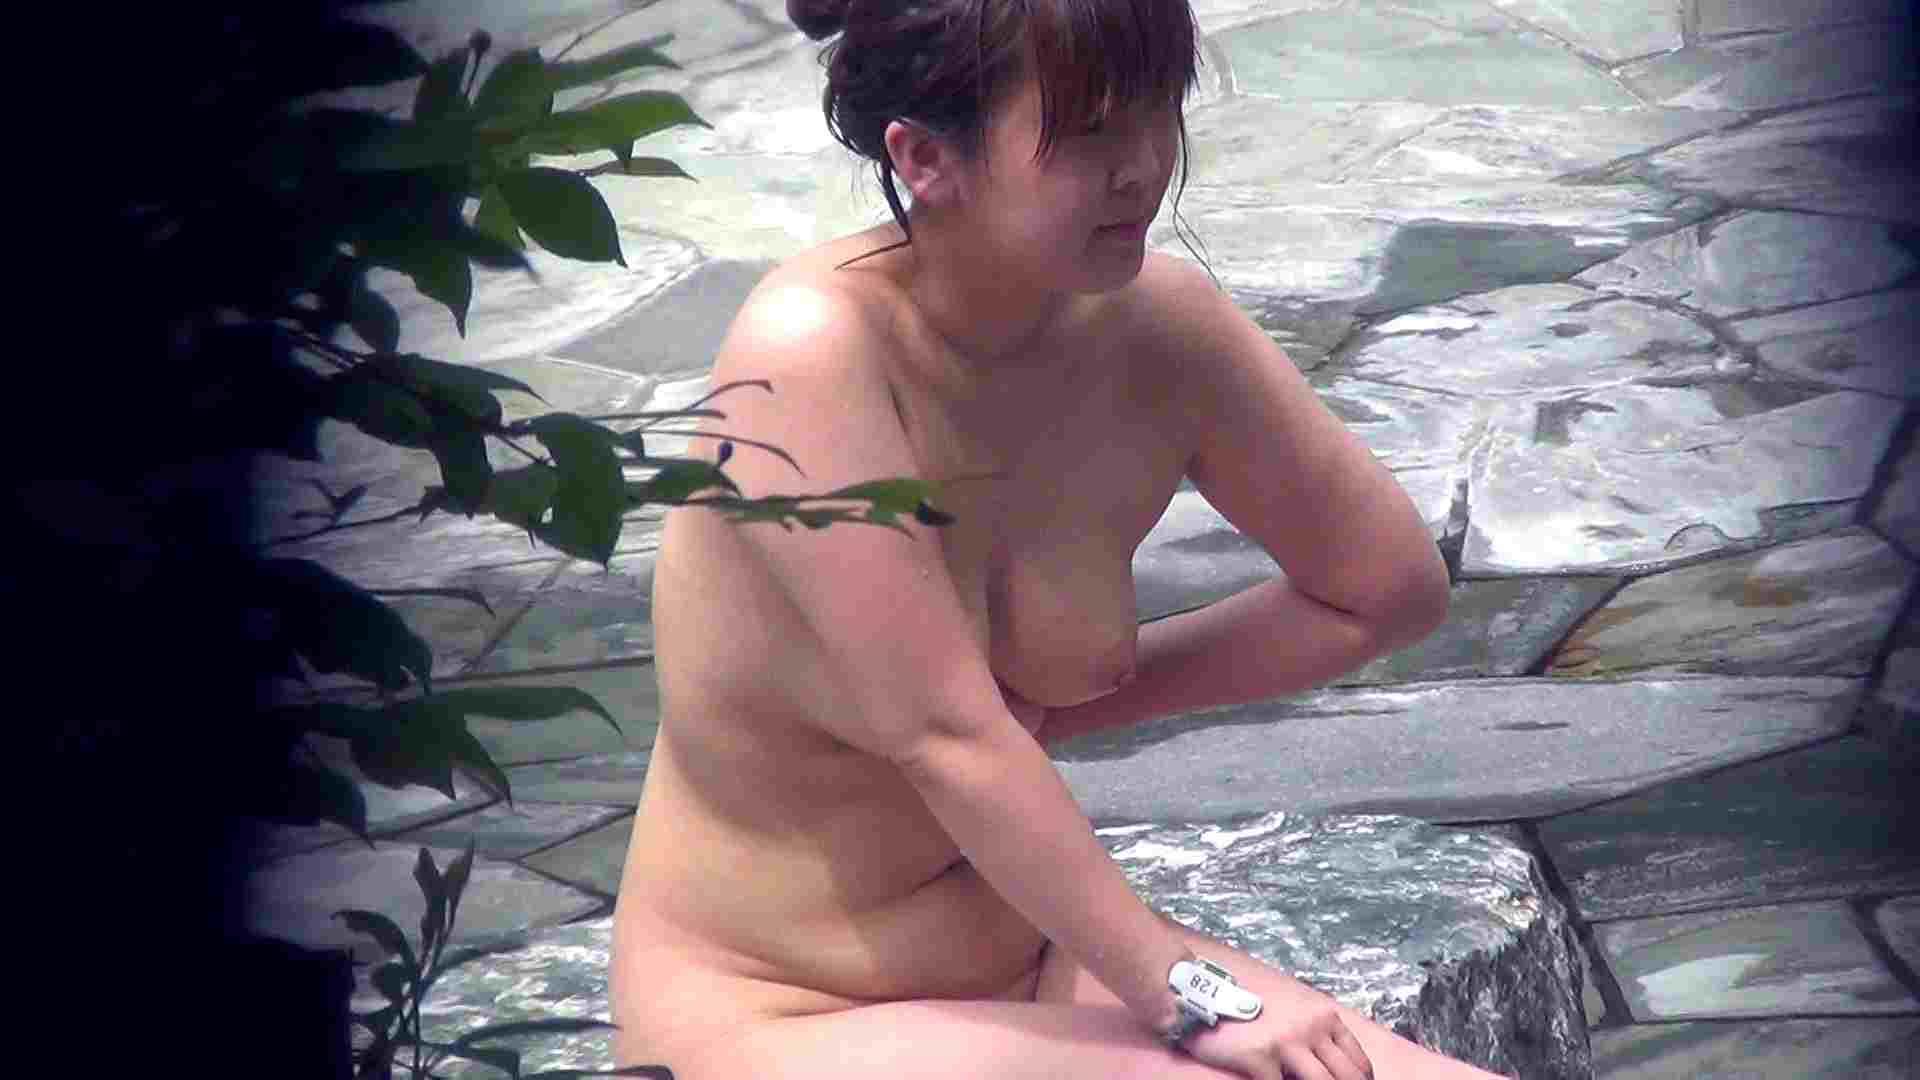 Aquaな露天風呂Vol.275 盗撮  40連発 15